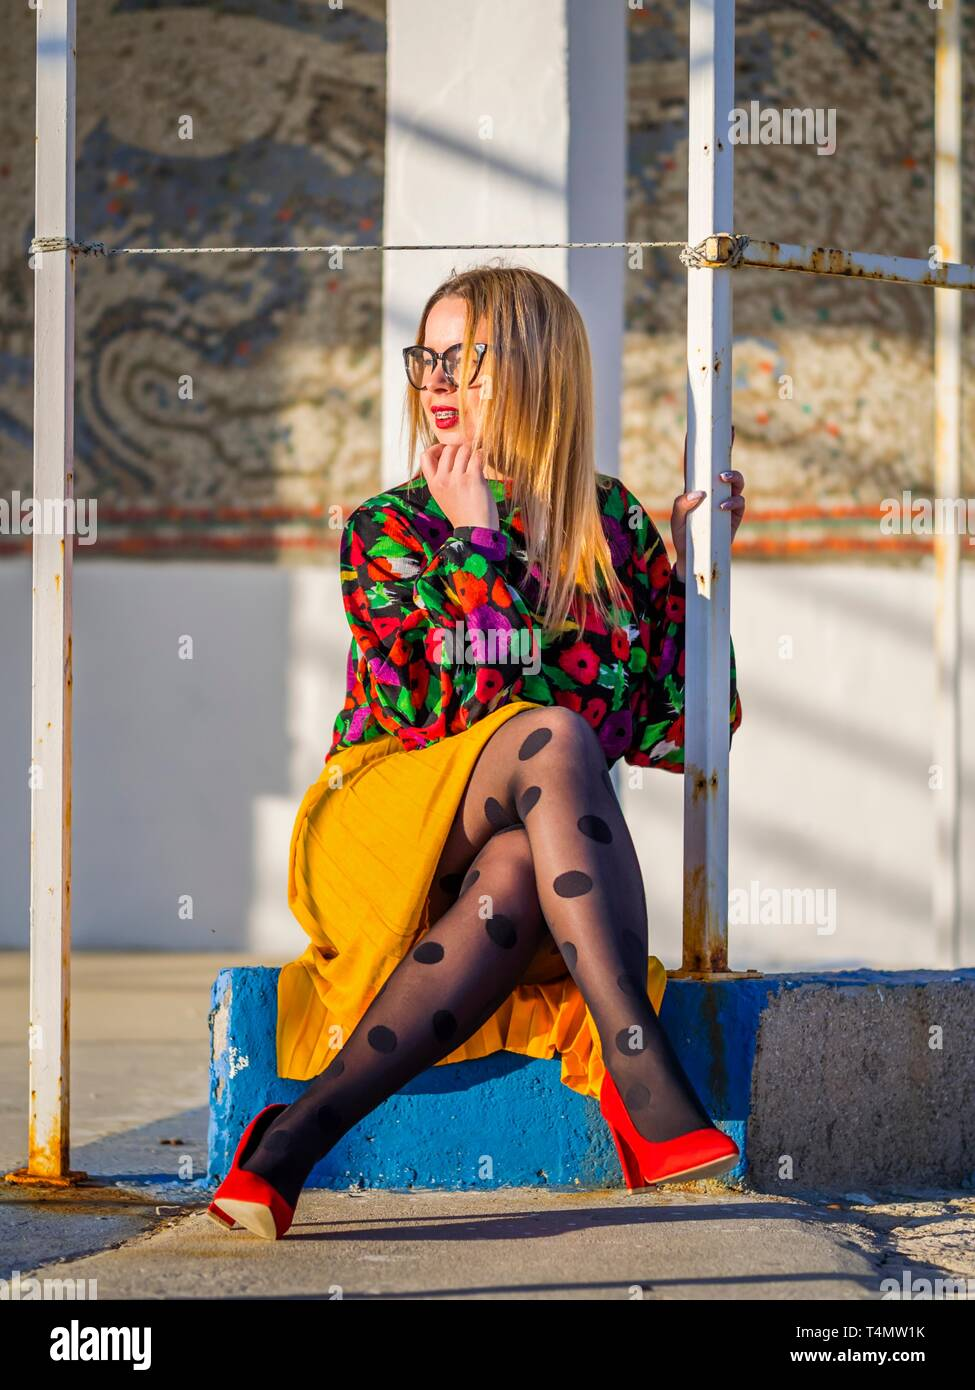 Young woman legs heels enjoying sun - Stock Image